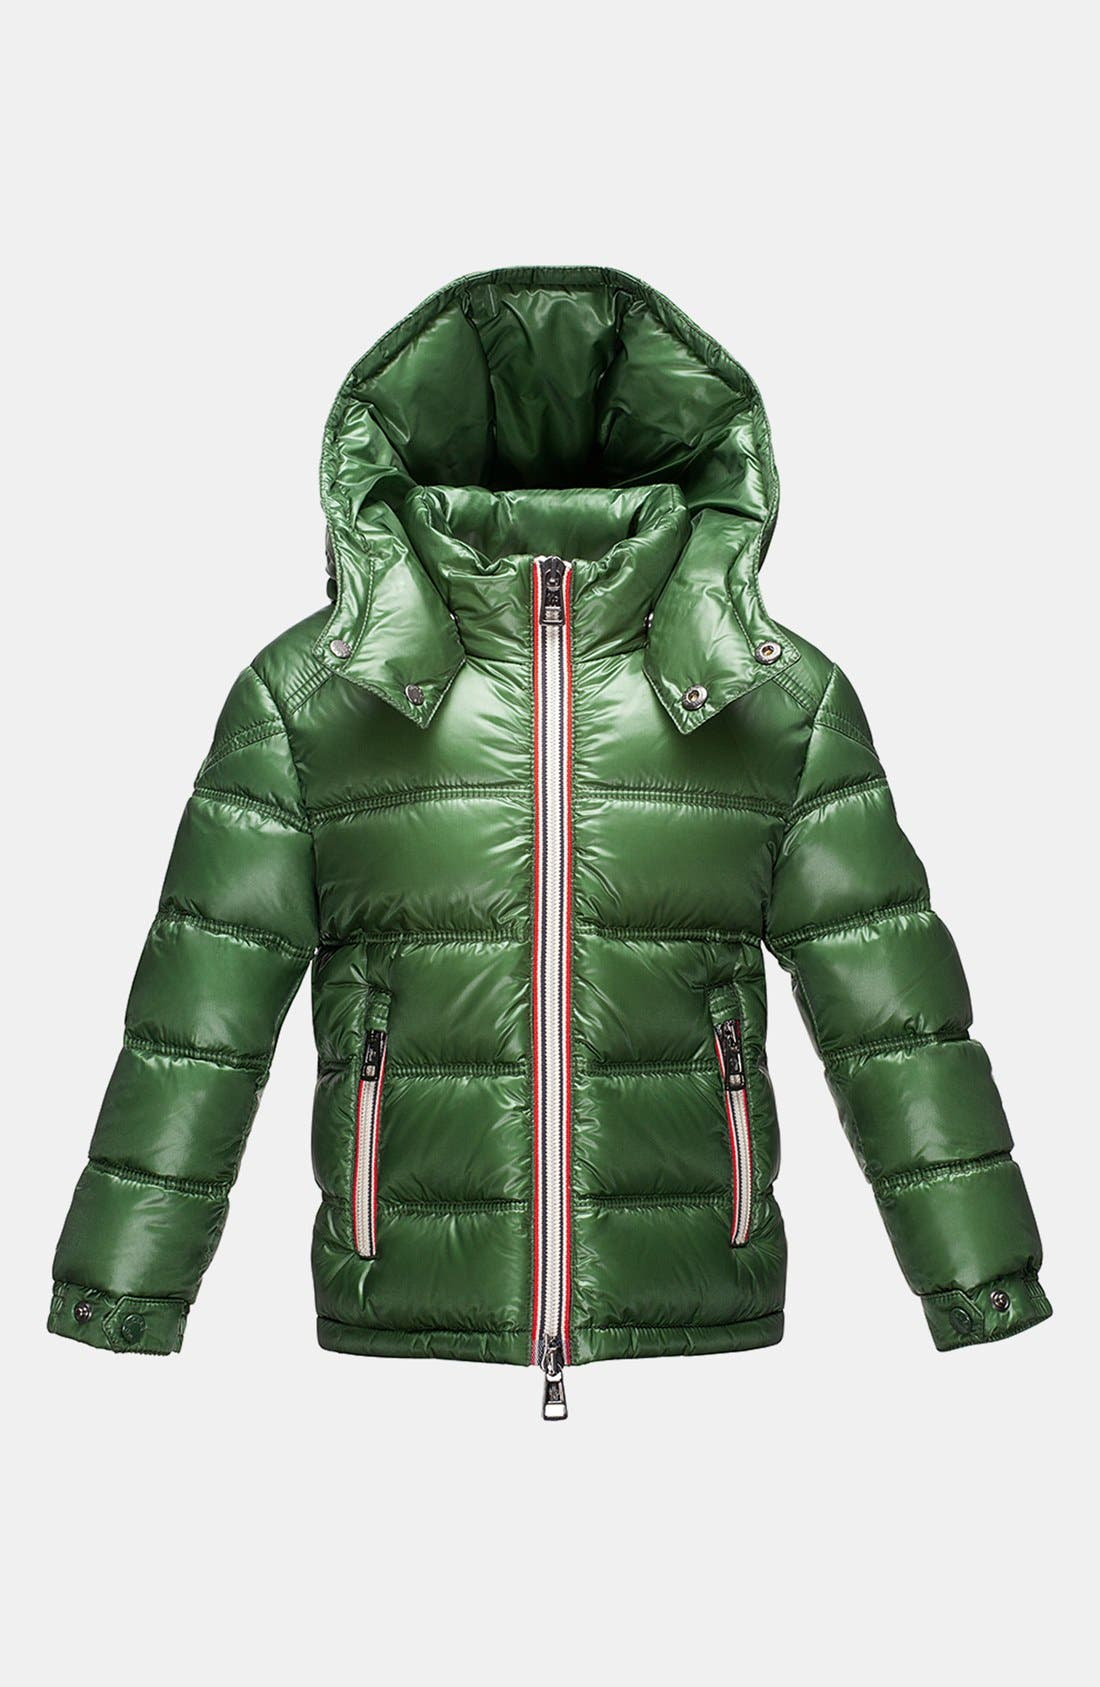 Alternate Image 1 Selected - Moncler 'Gaston' Hooded Down Jacket (Toddler Boys)